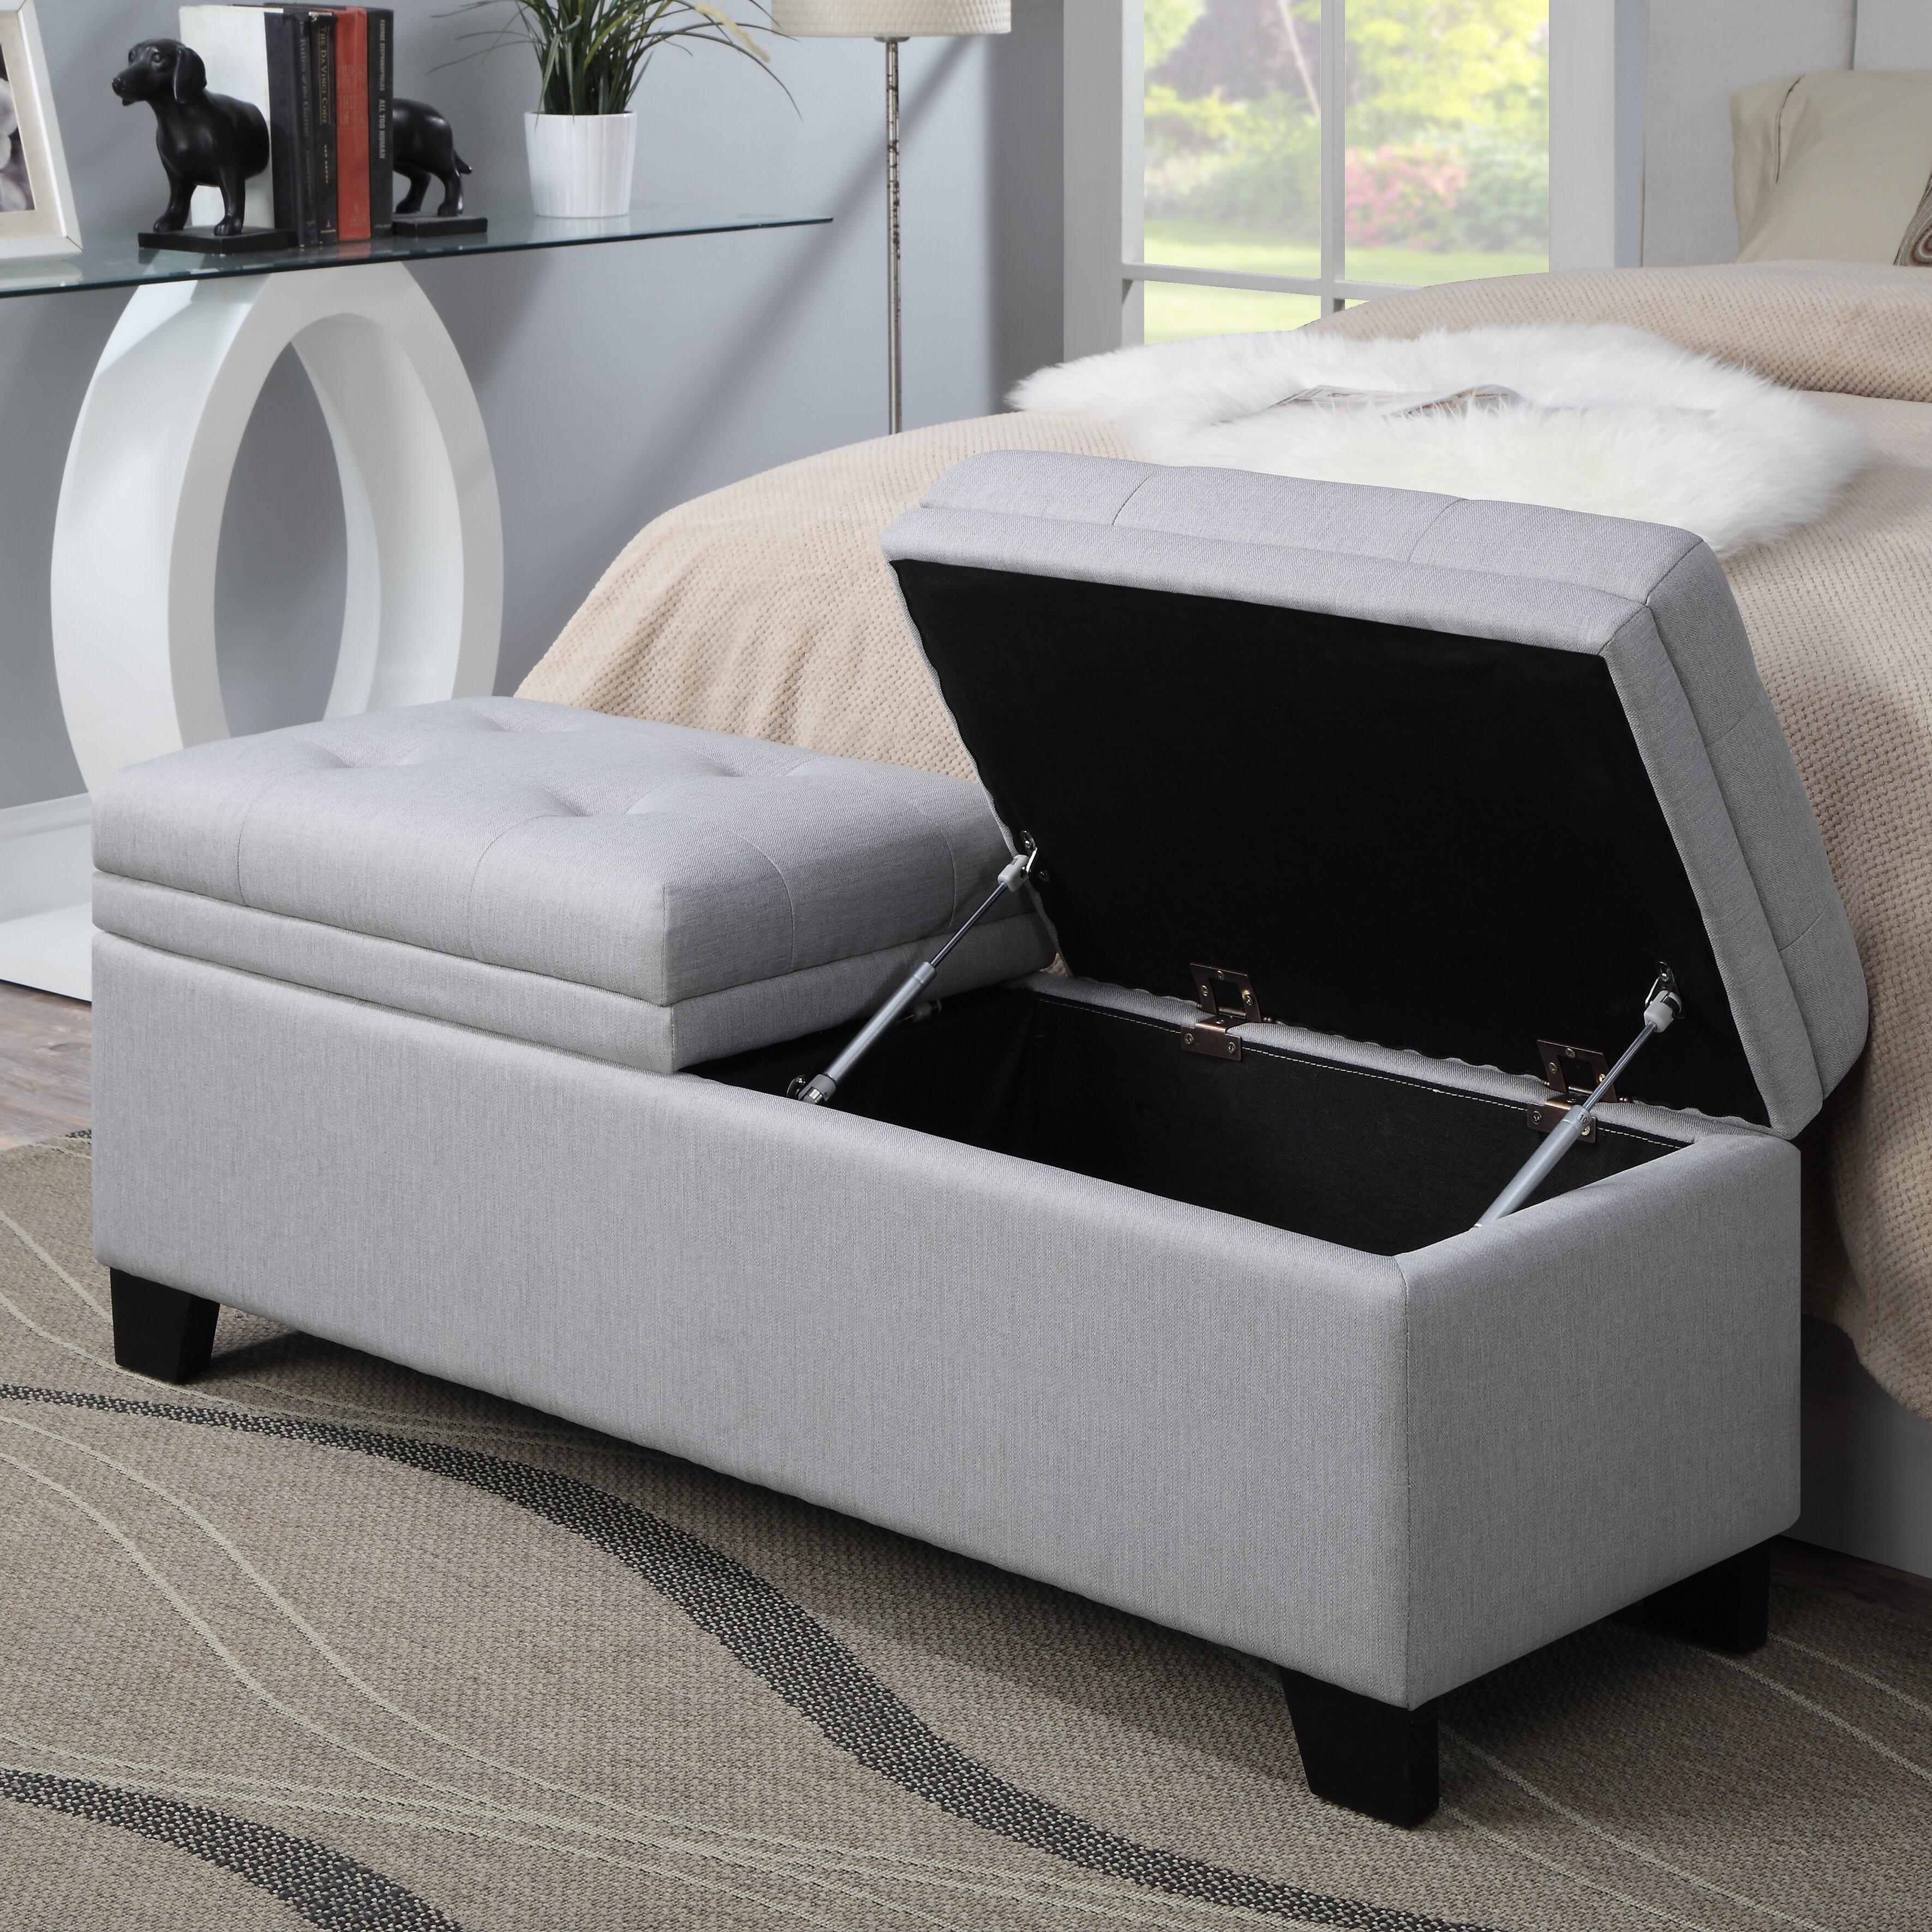 PRI Lilac Fields Upholstered Bedroom Storage Bench